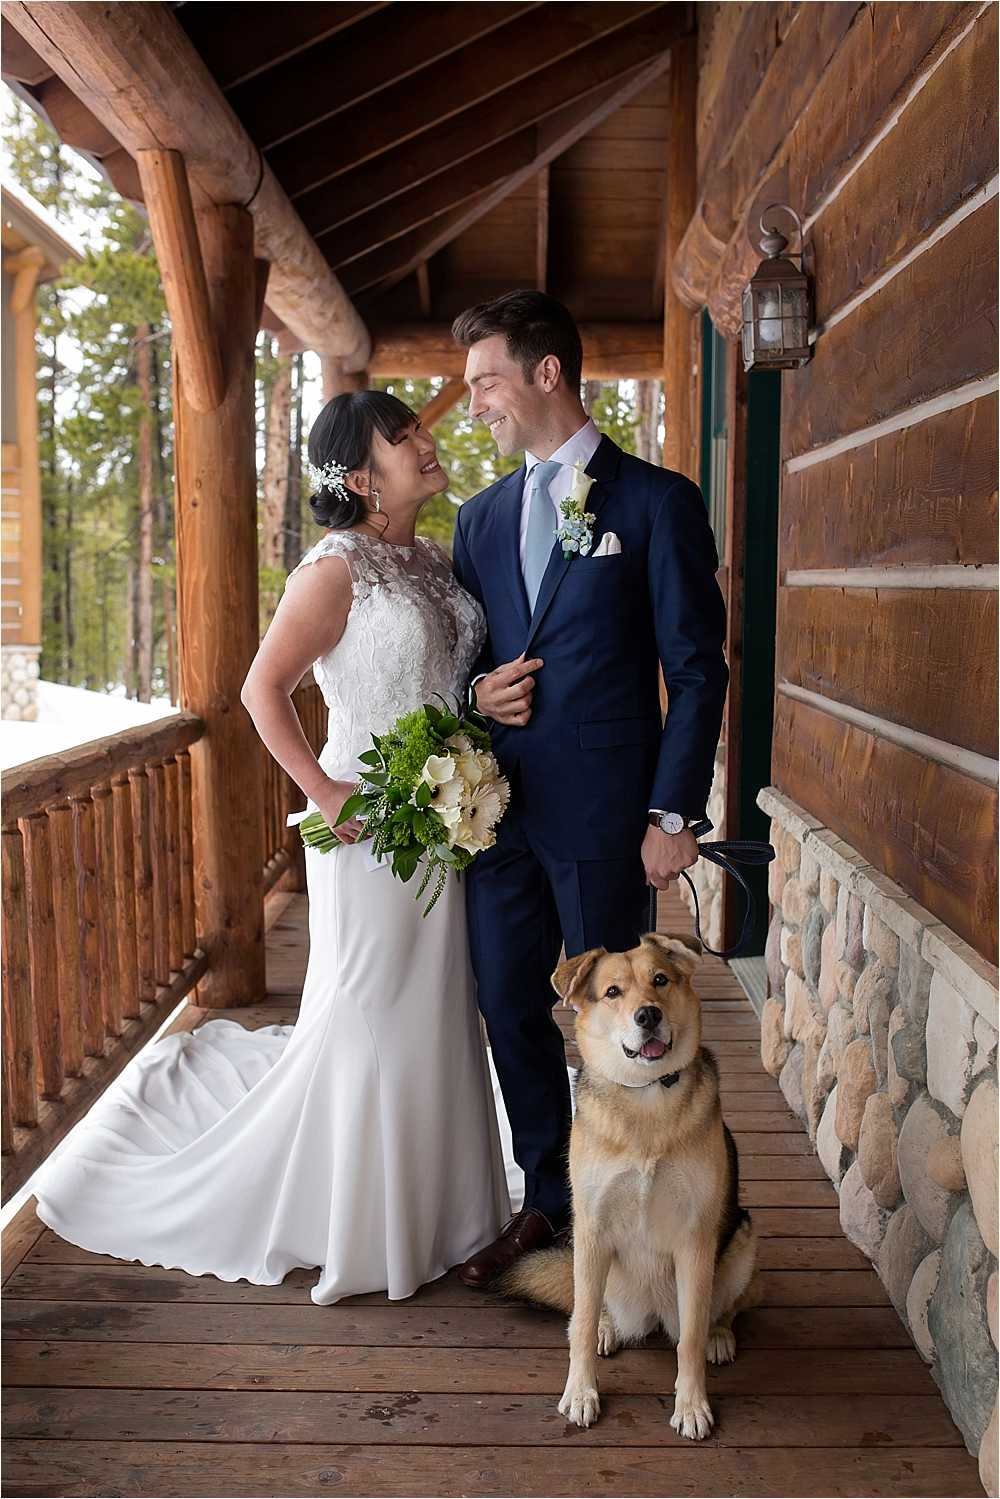 Bamboo + Earl's Lodge at Breckenridge Wedding_0051.jpg